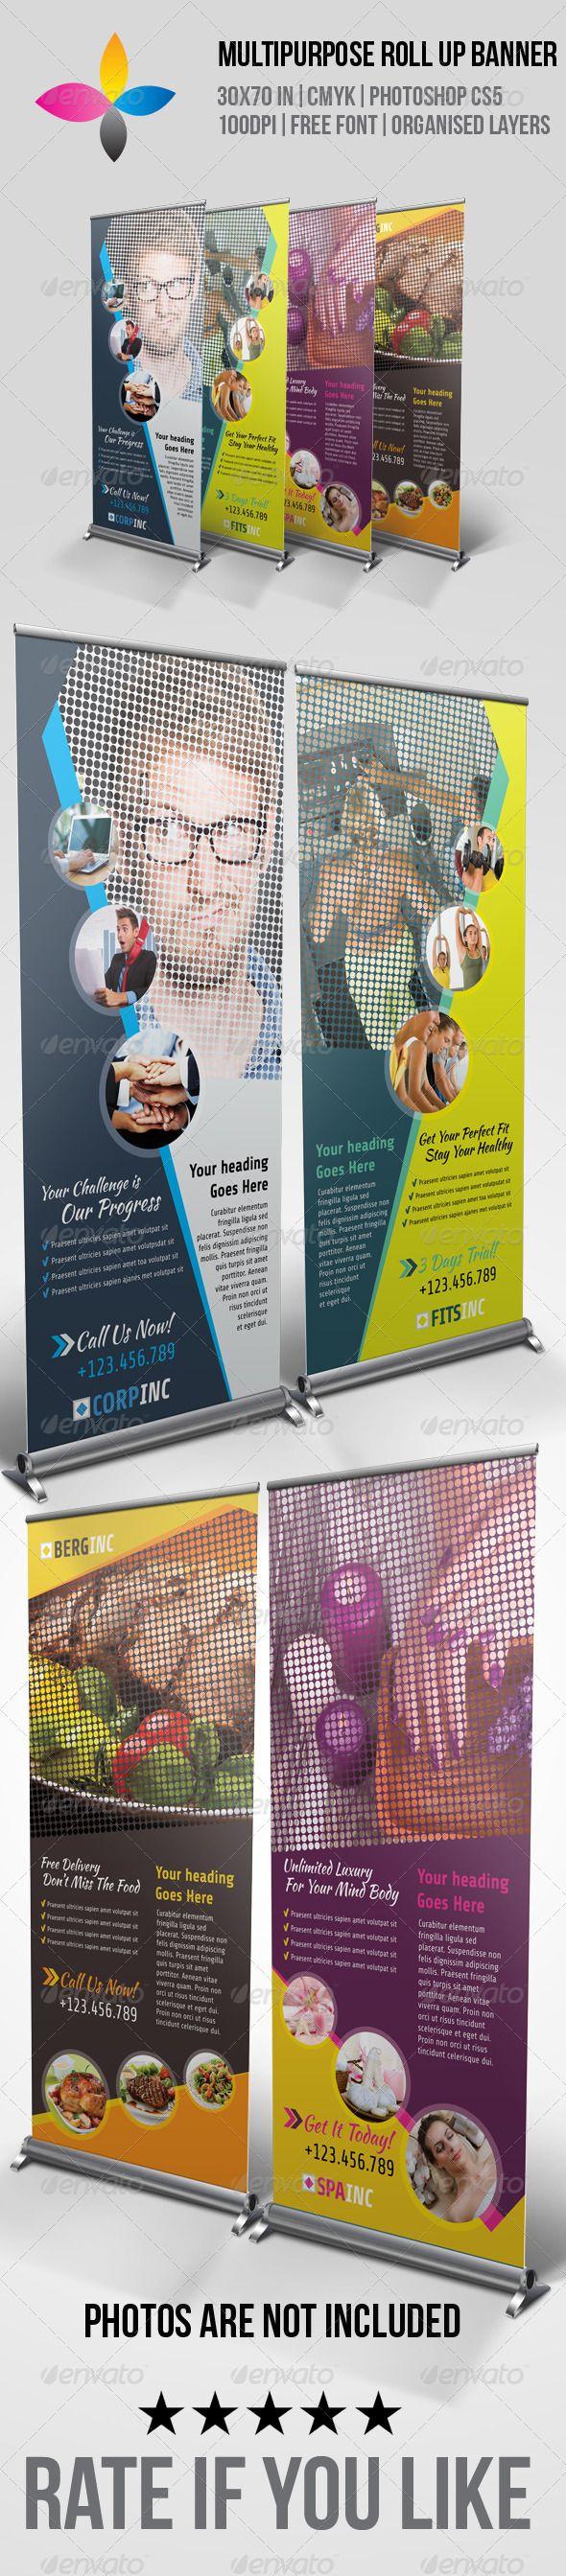 Multipurpose Roll Up Banner Template #design Download: graphicprime.com/...